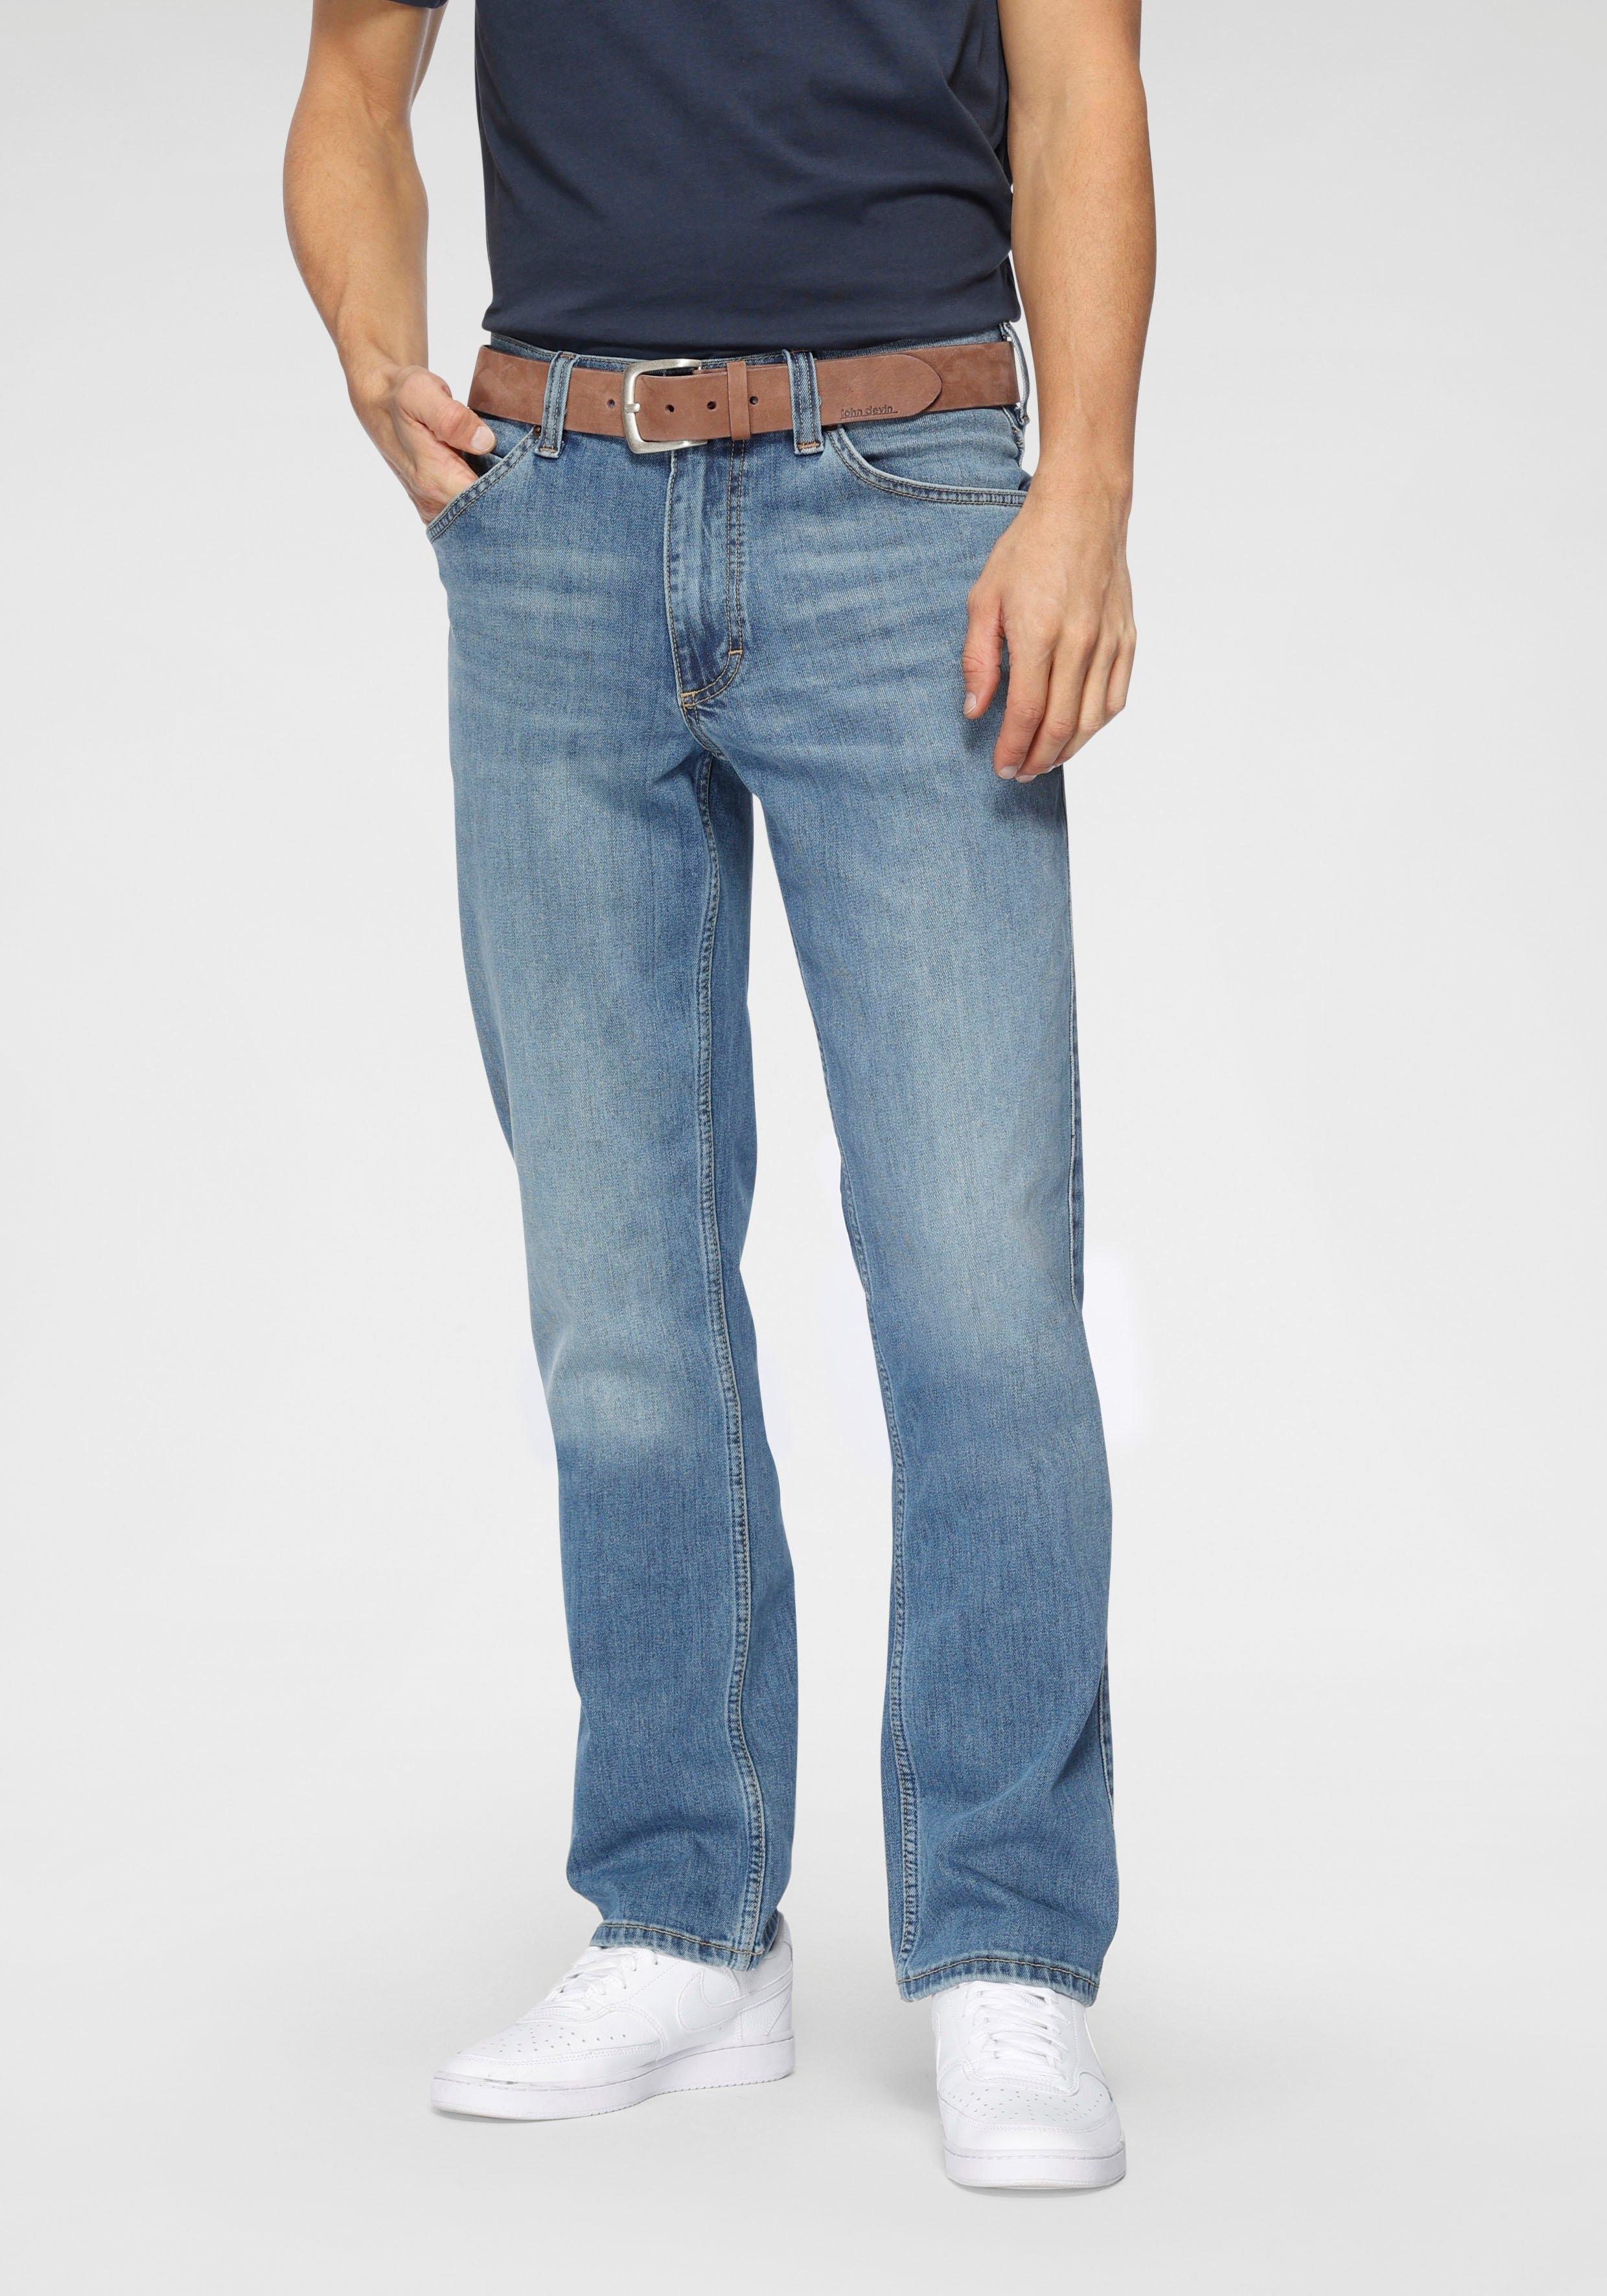 MUSTANG straight jeans Tramper in five-pocketsmodel - gratis ruilen op otto.nl